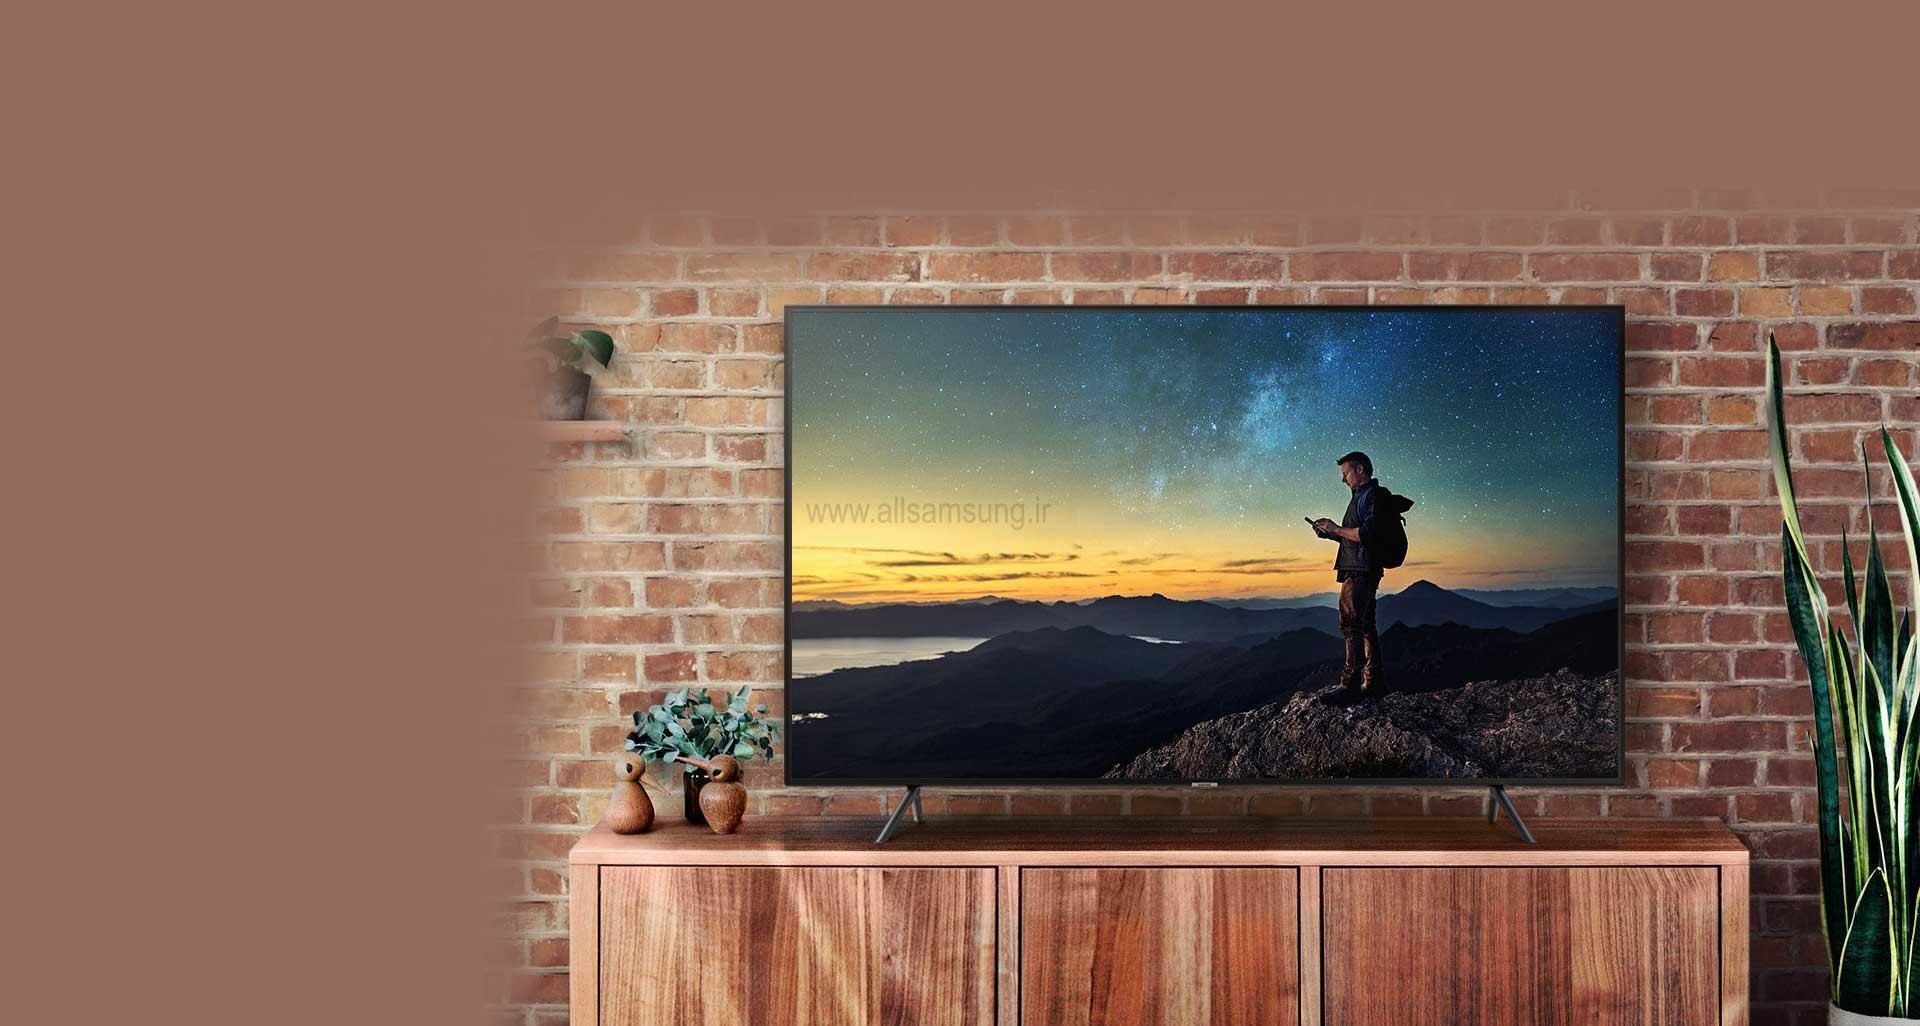 وضوحی بی نظیر با تلویزیون NU7100 سامسونگ